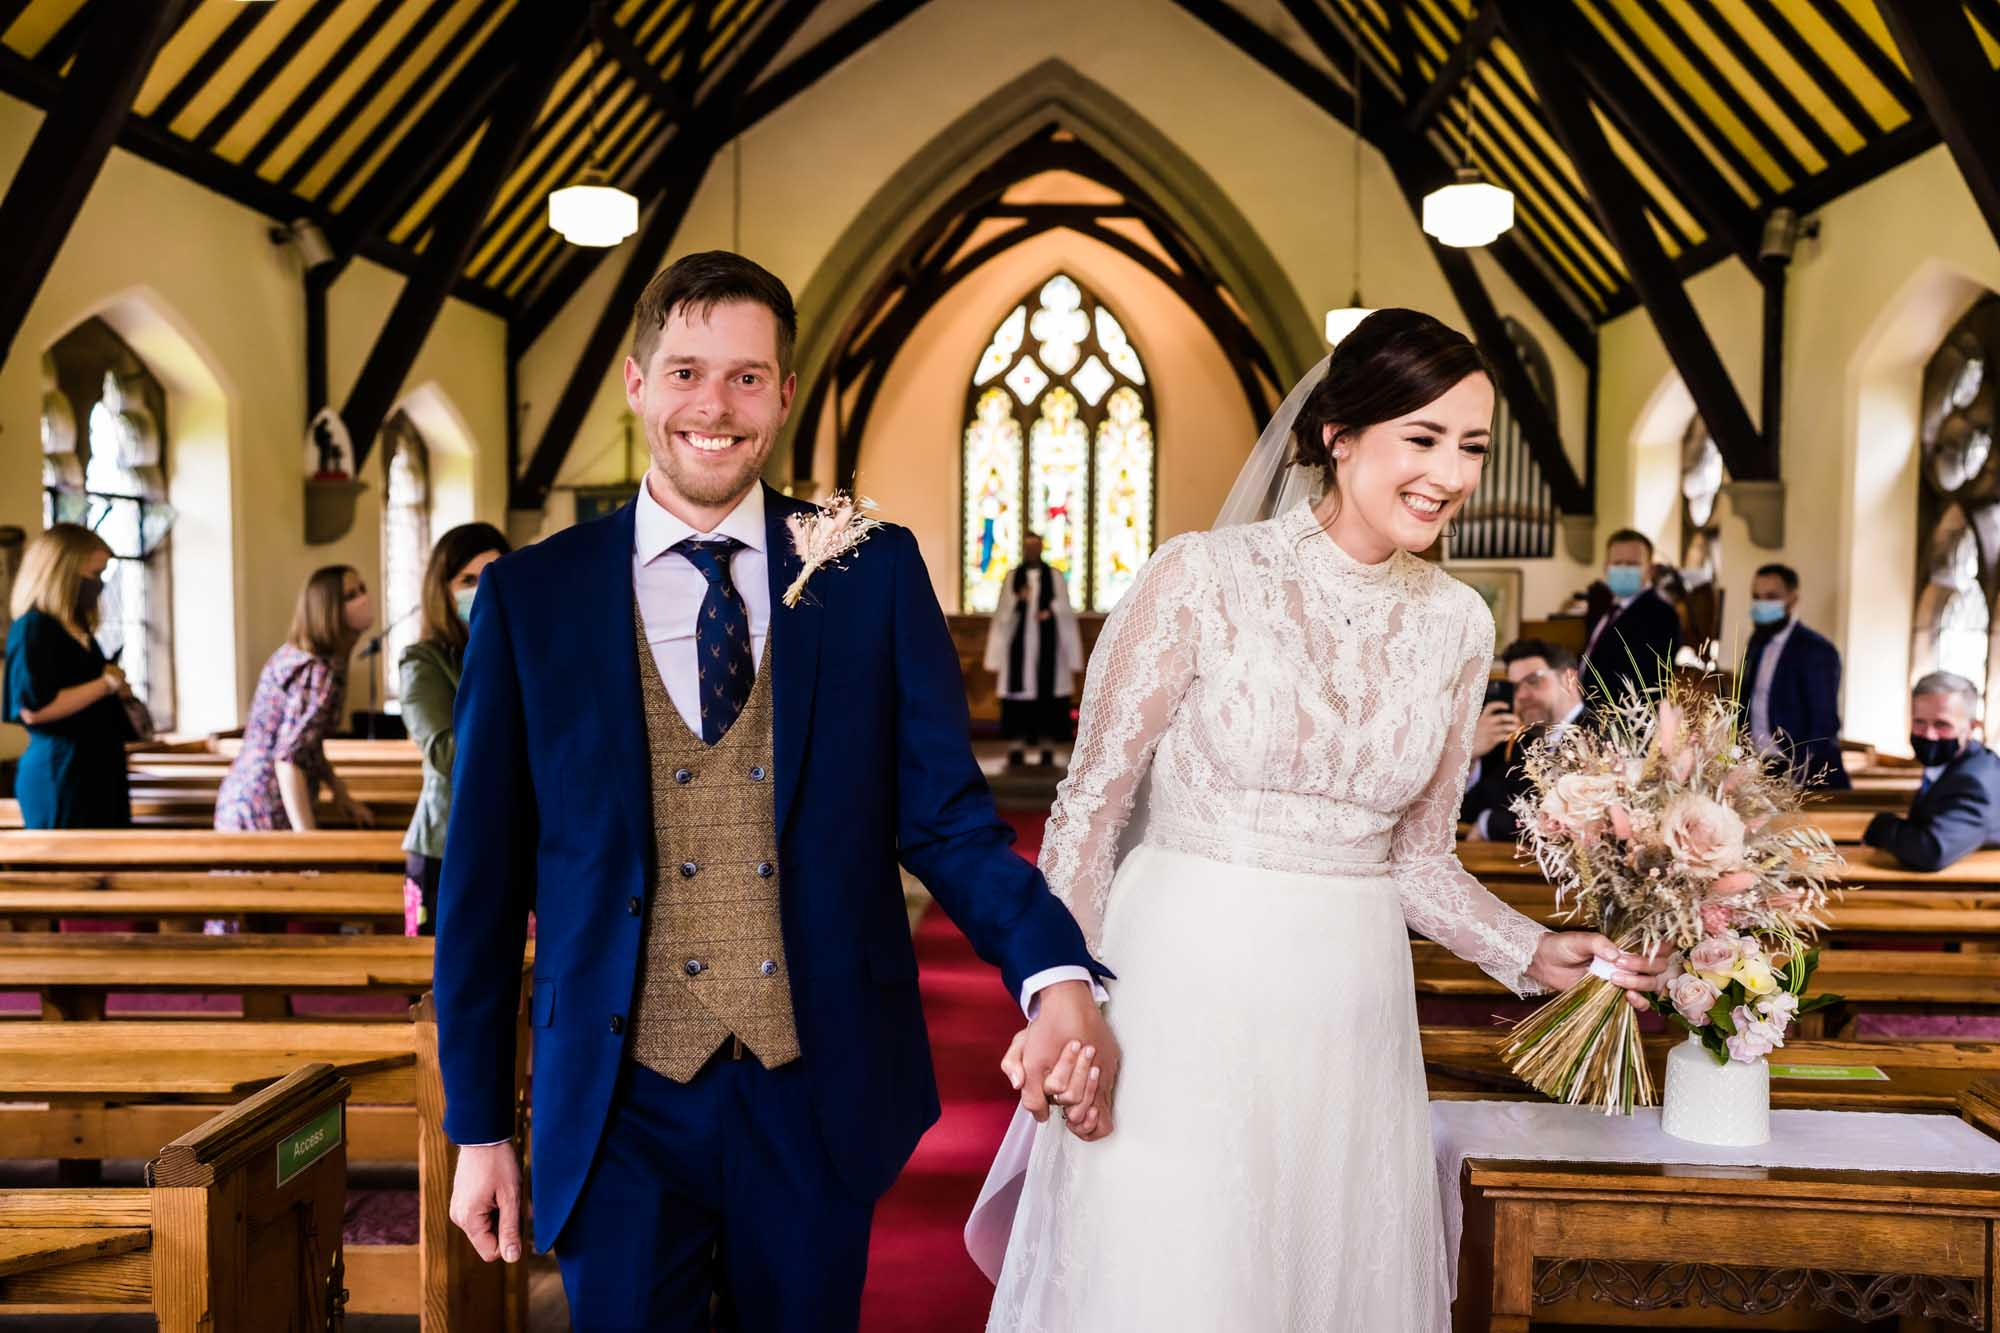 St Marks Dunham Massey Wedding Photography